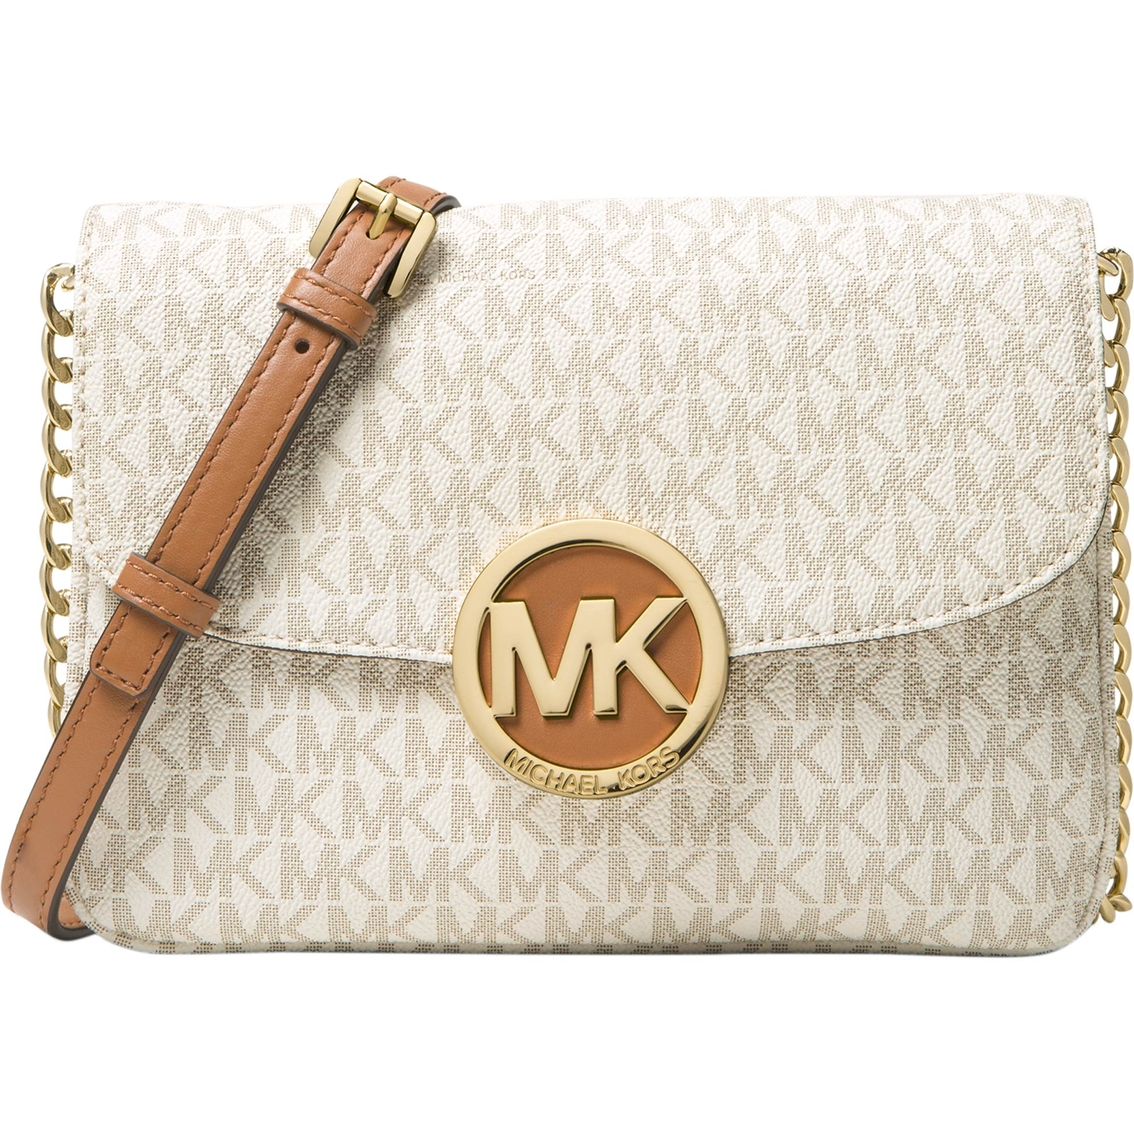 9316a7d83c20 Michael Kors Fulton Flap Gusset Crossbody Handbag | Handbags | Shop ...